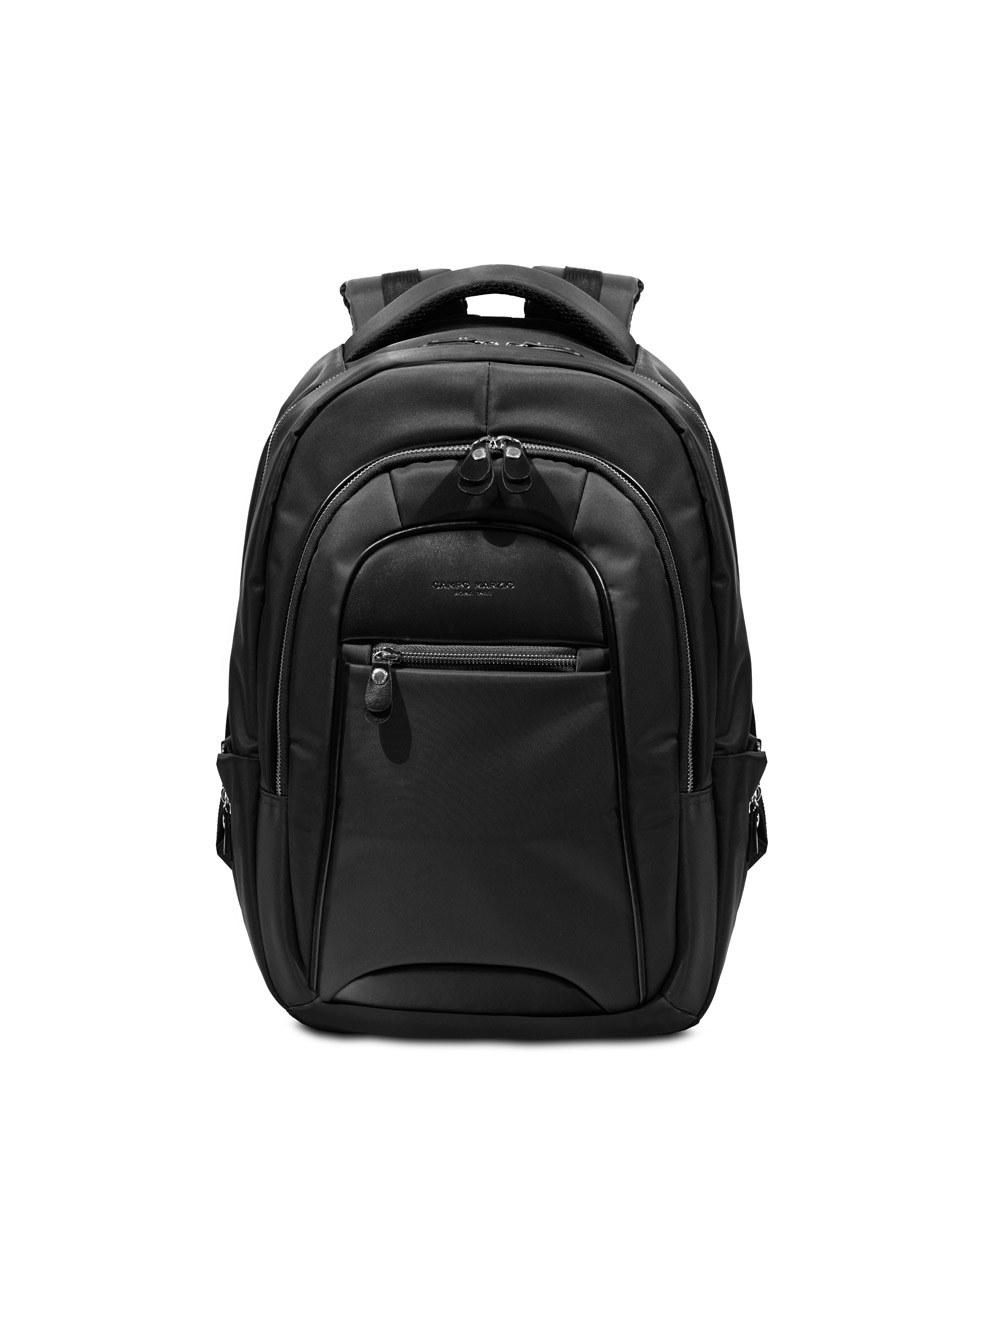 Backpack Maxi Livingstone - Black